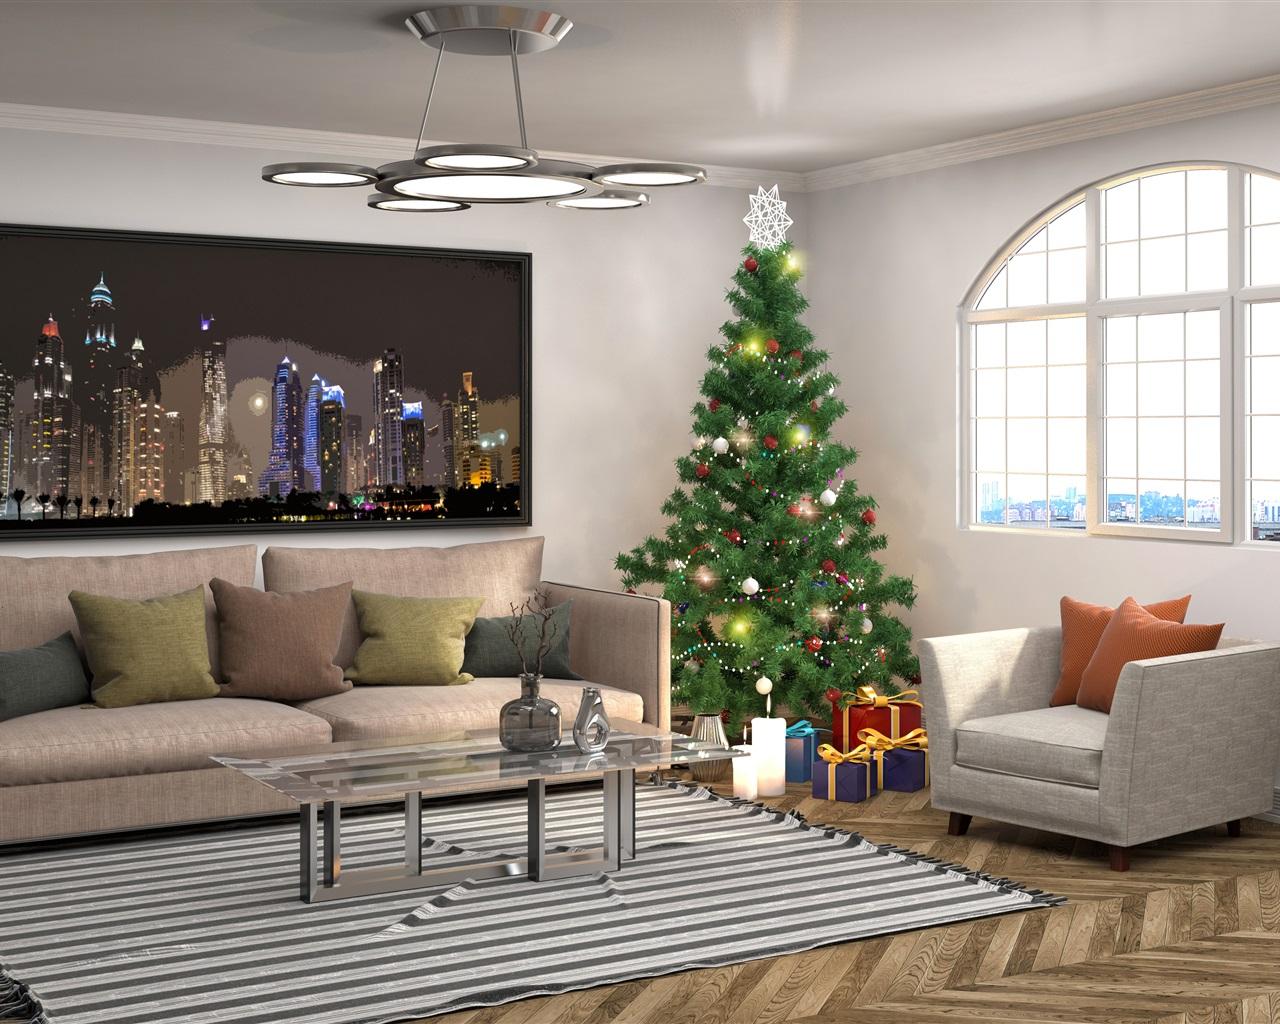 Wallpaper Interior design, Christmas tree, pillow, sofa ...